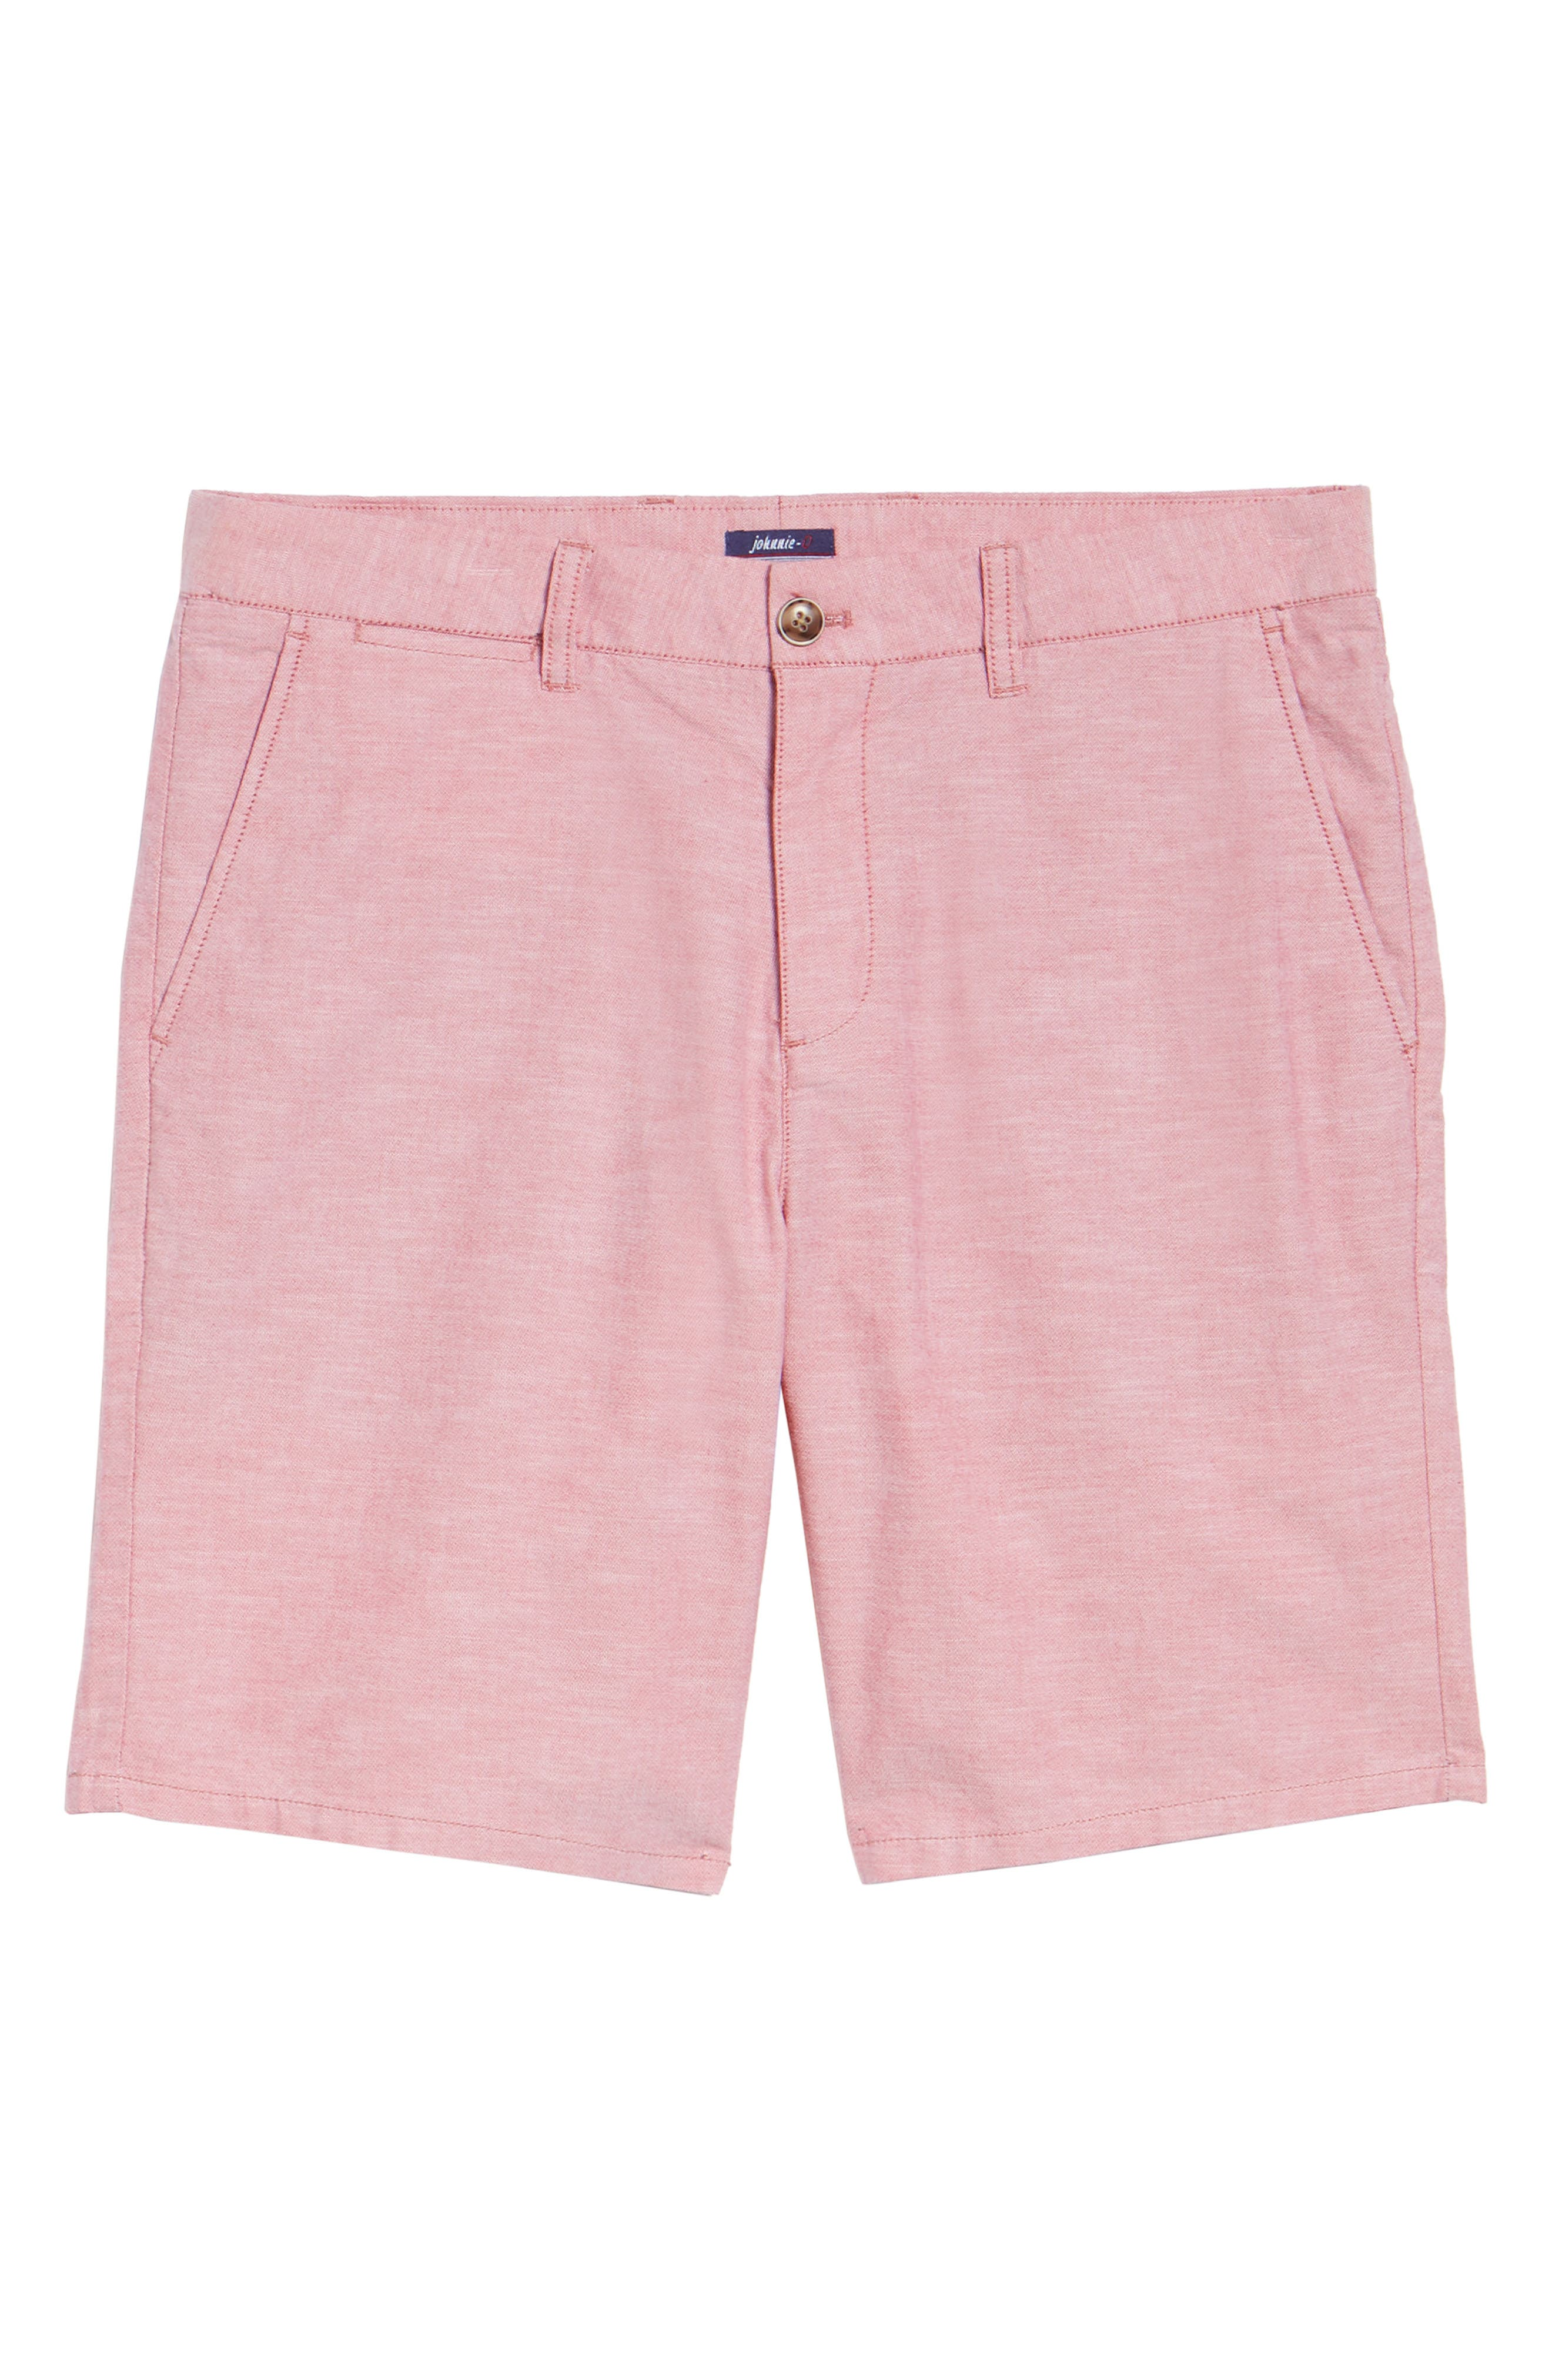 Merritt Regular Fit Shorts,                             Alternate thumbnail 6, color,                             Malibu Red